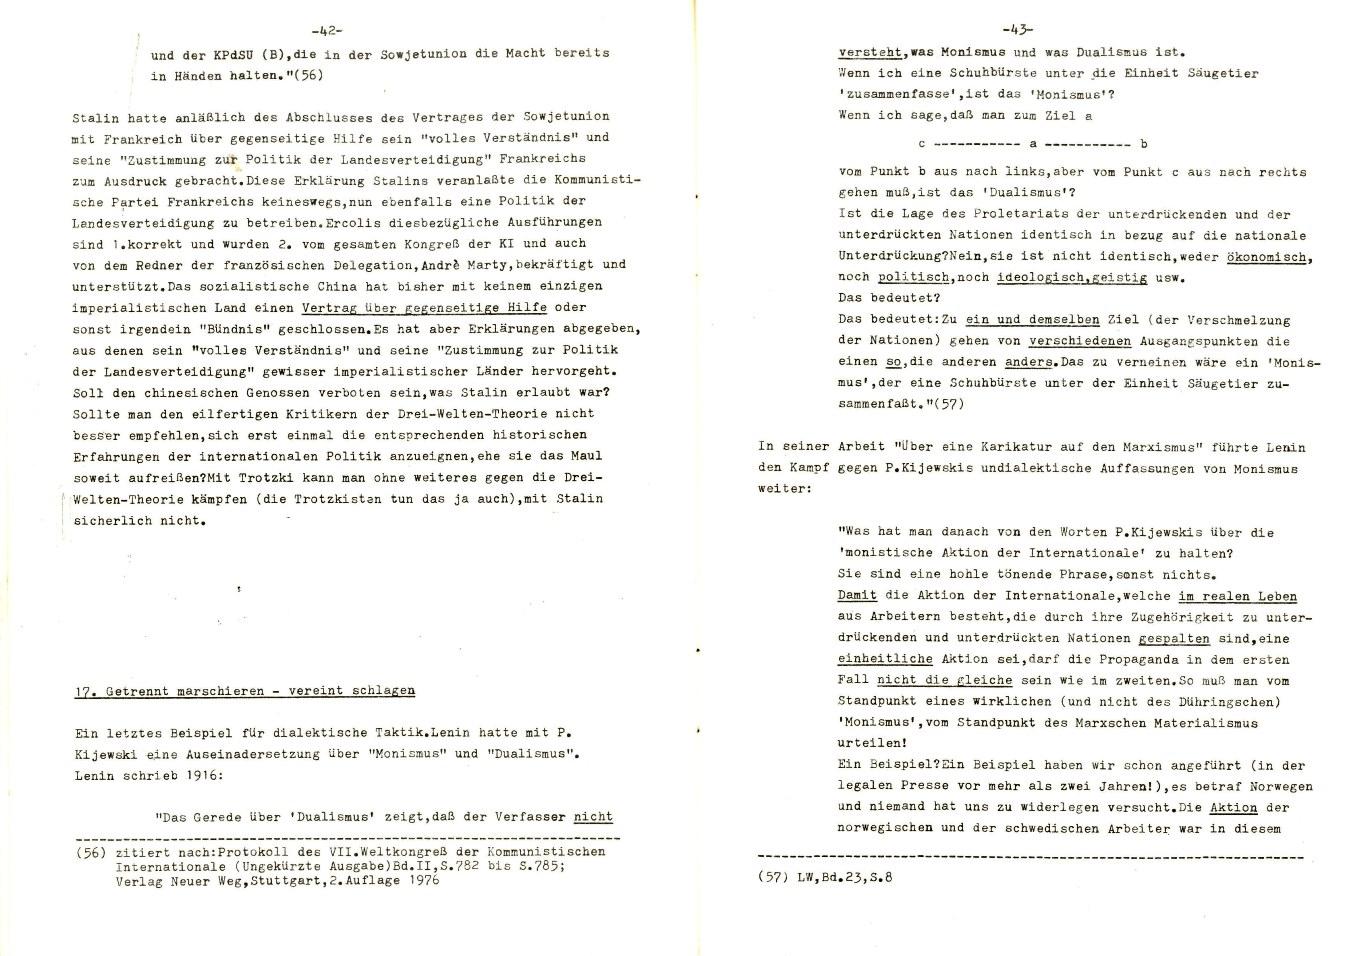 Muenchen_Kampf_dem_Revisionismus_1978_04_05_23